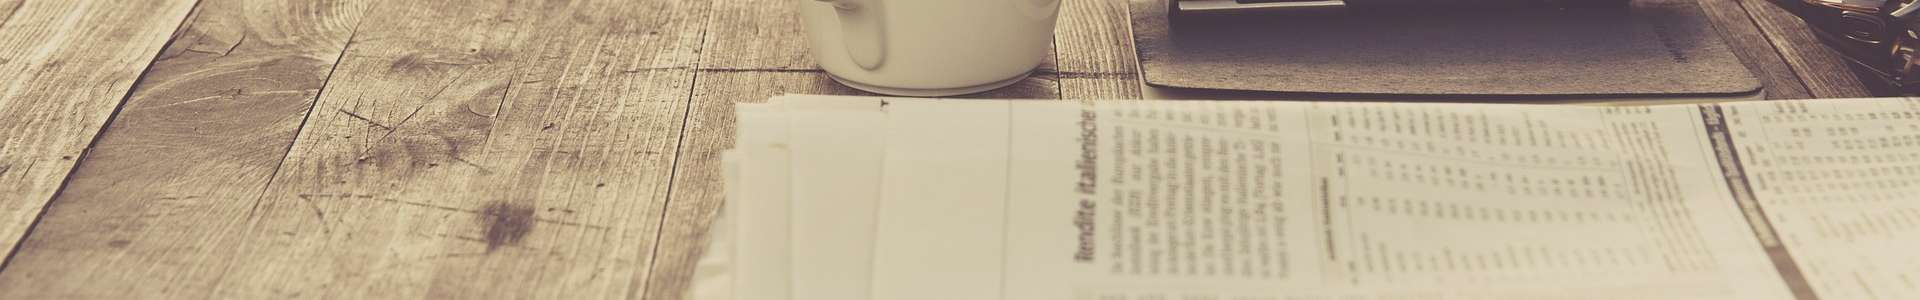 Kaffeereport 2020